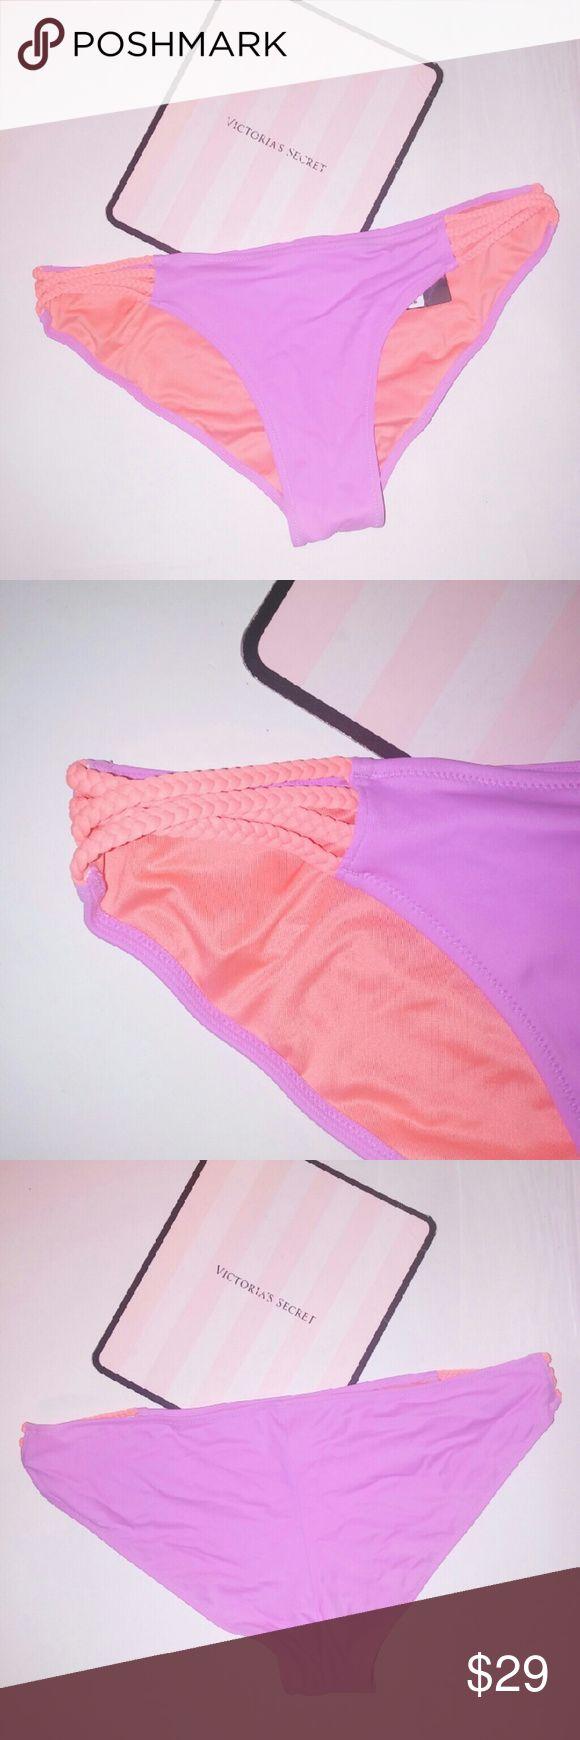 Victoria Secret Swim Suit Bikini Bottom Victoria Secret Swim Suit Bikini Bottom Large Purple orange Braided sides New with tags Victoria's Secret Swim Bikinis